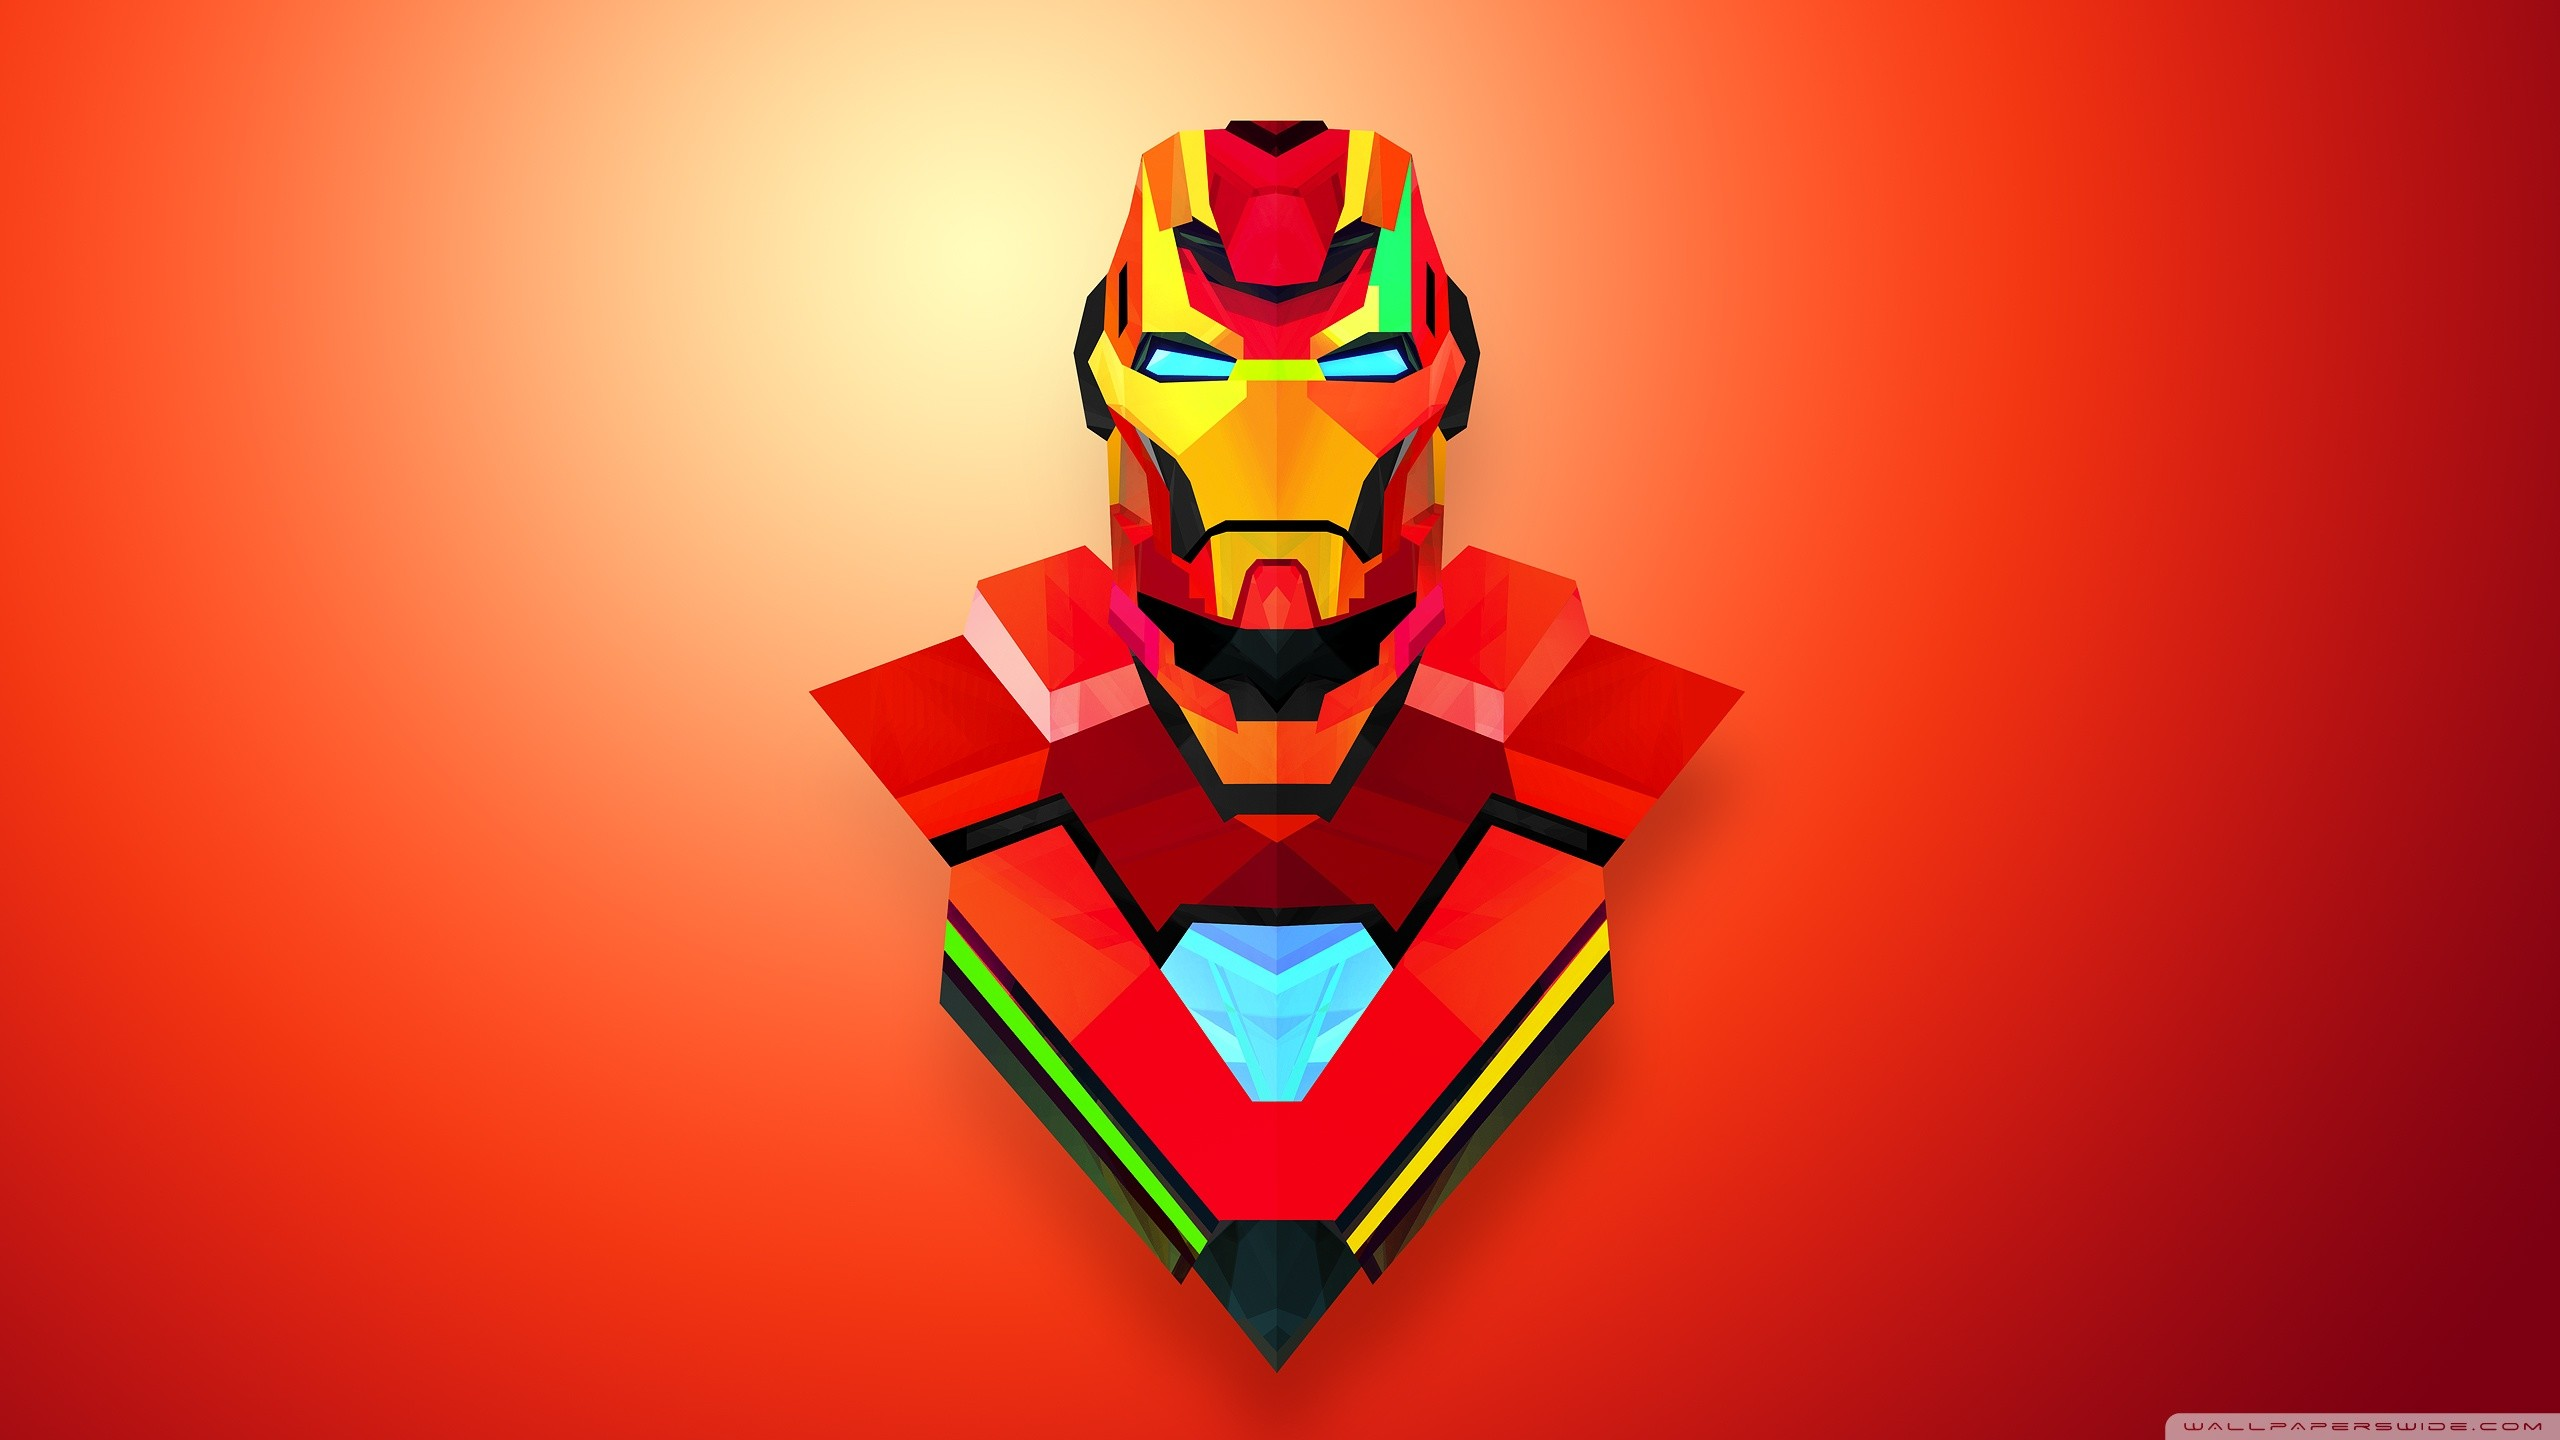 Iron Man Abstract Art HD Wide Wallpaper for Widescreen